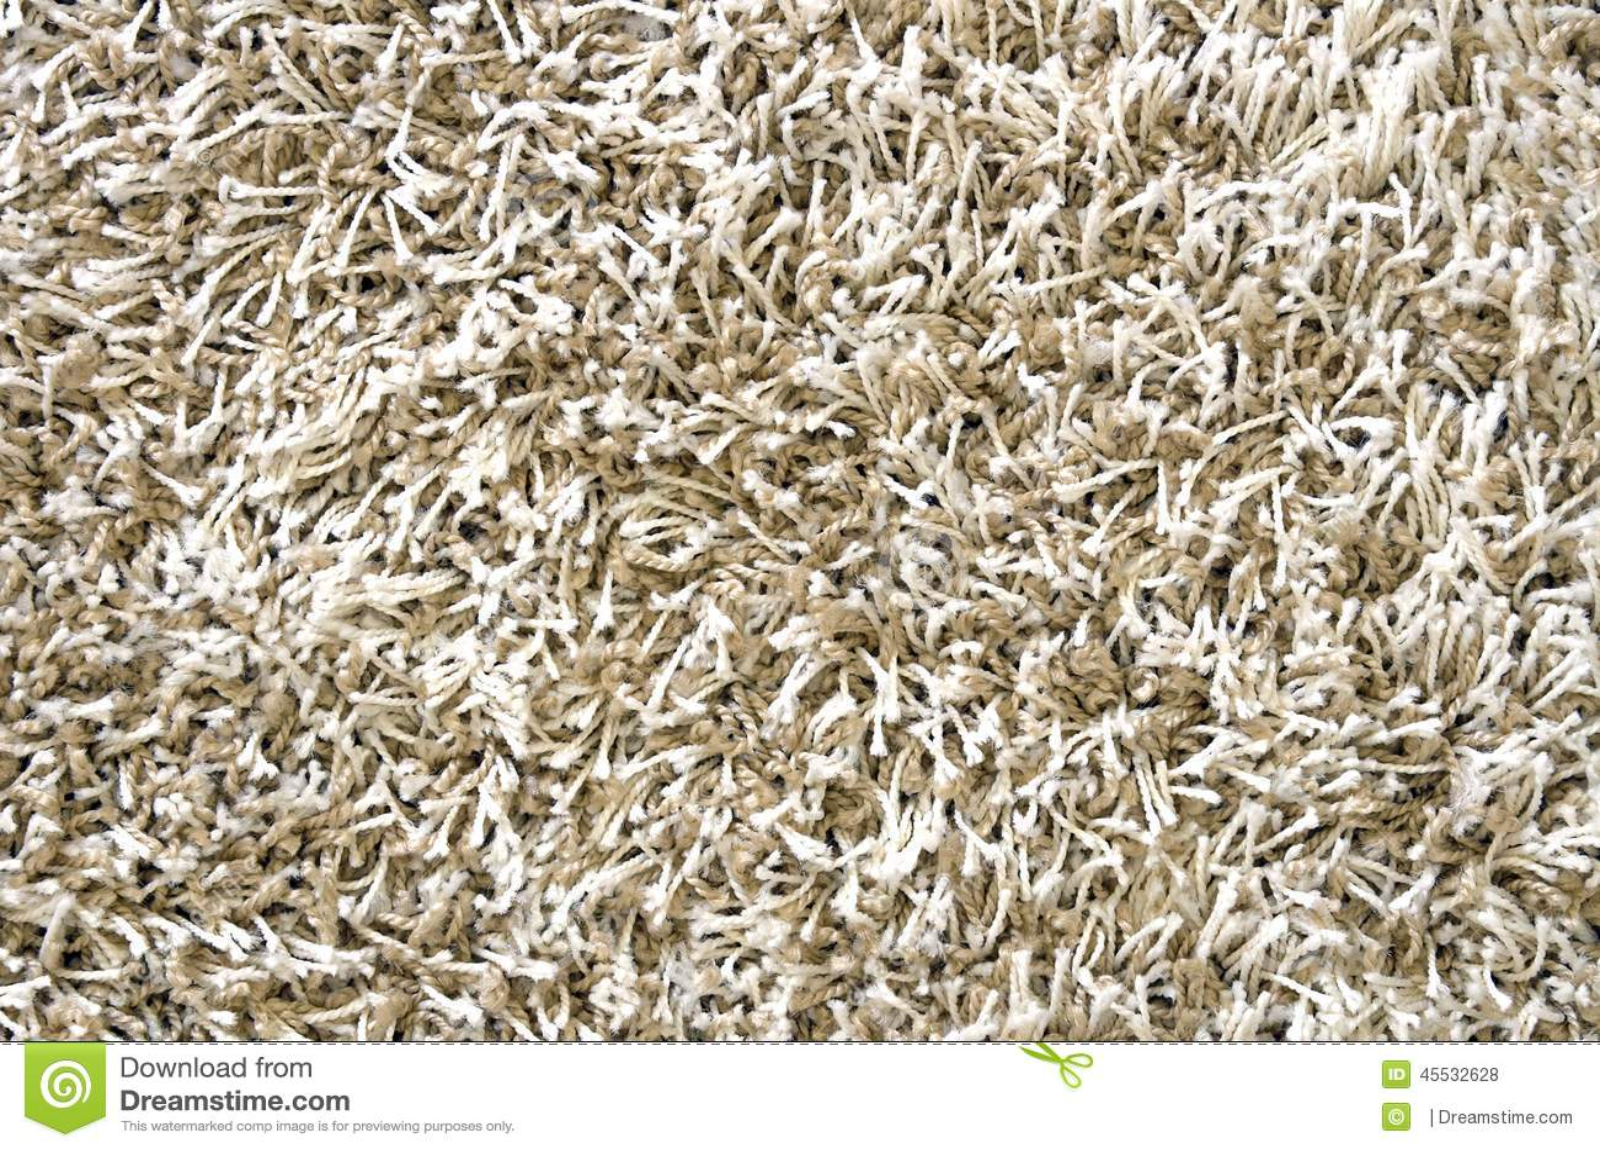 White Long Hair Carpet Texture Stock Photo Image 45532628